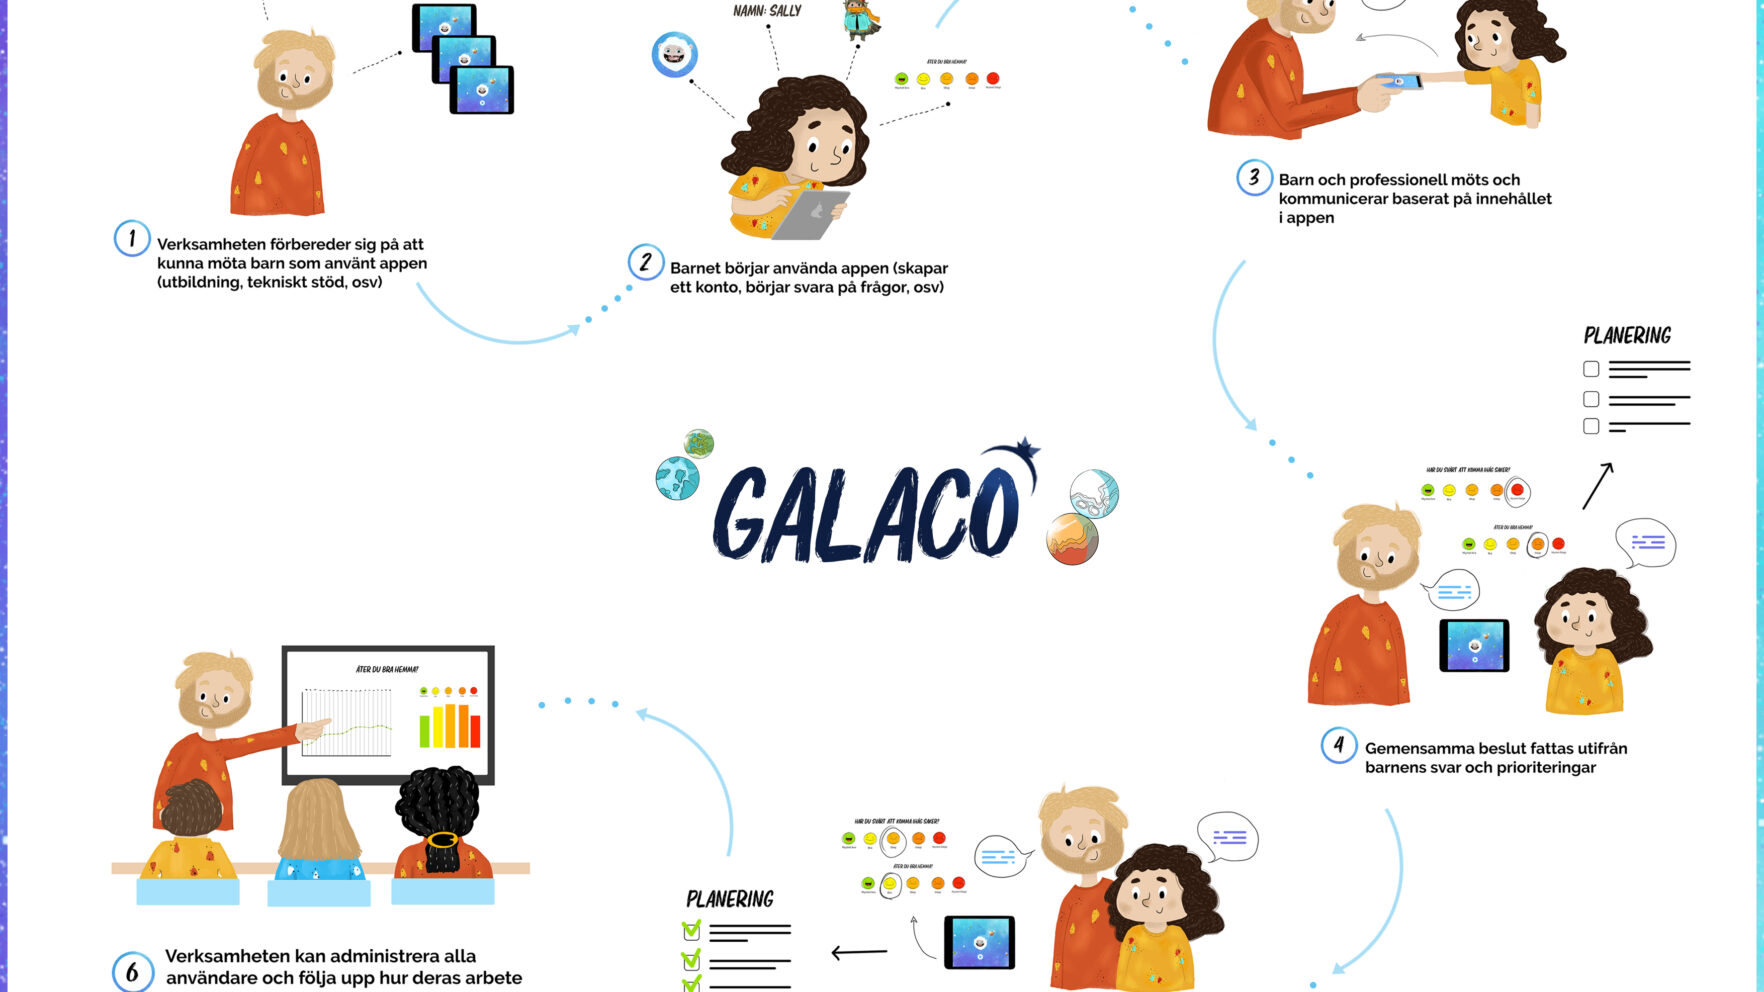 Galaco